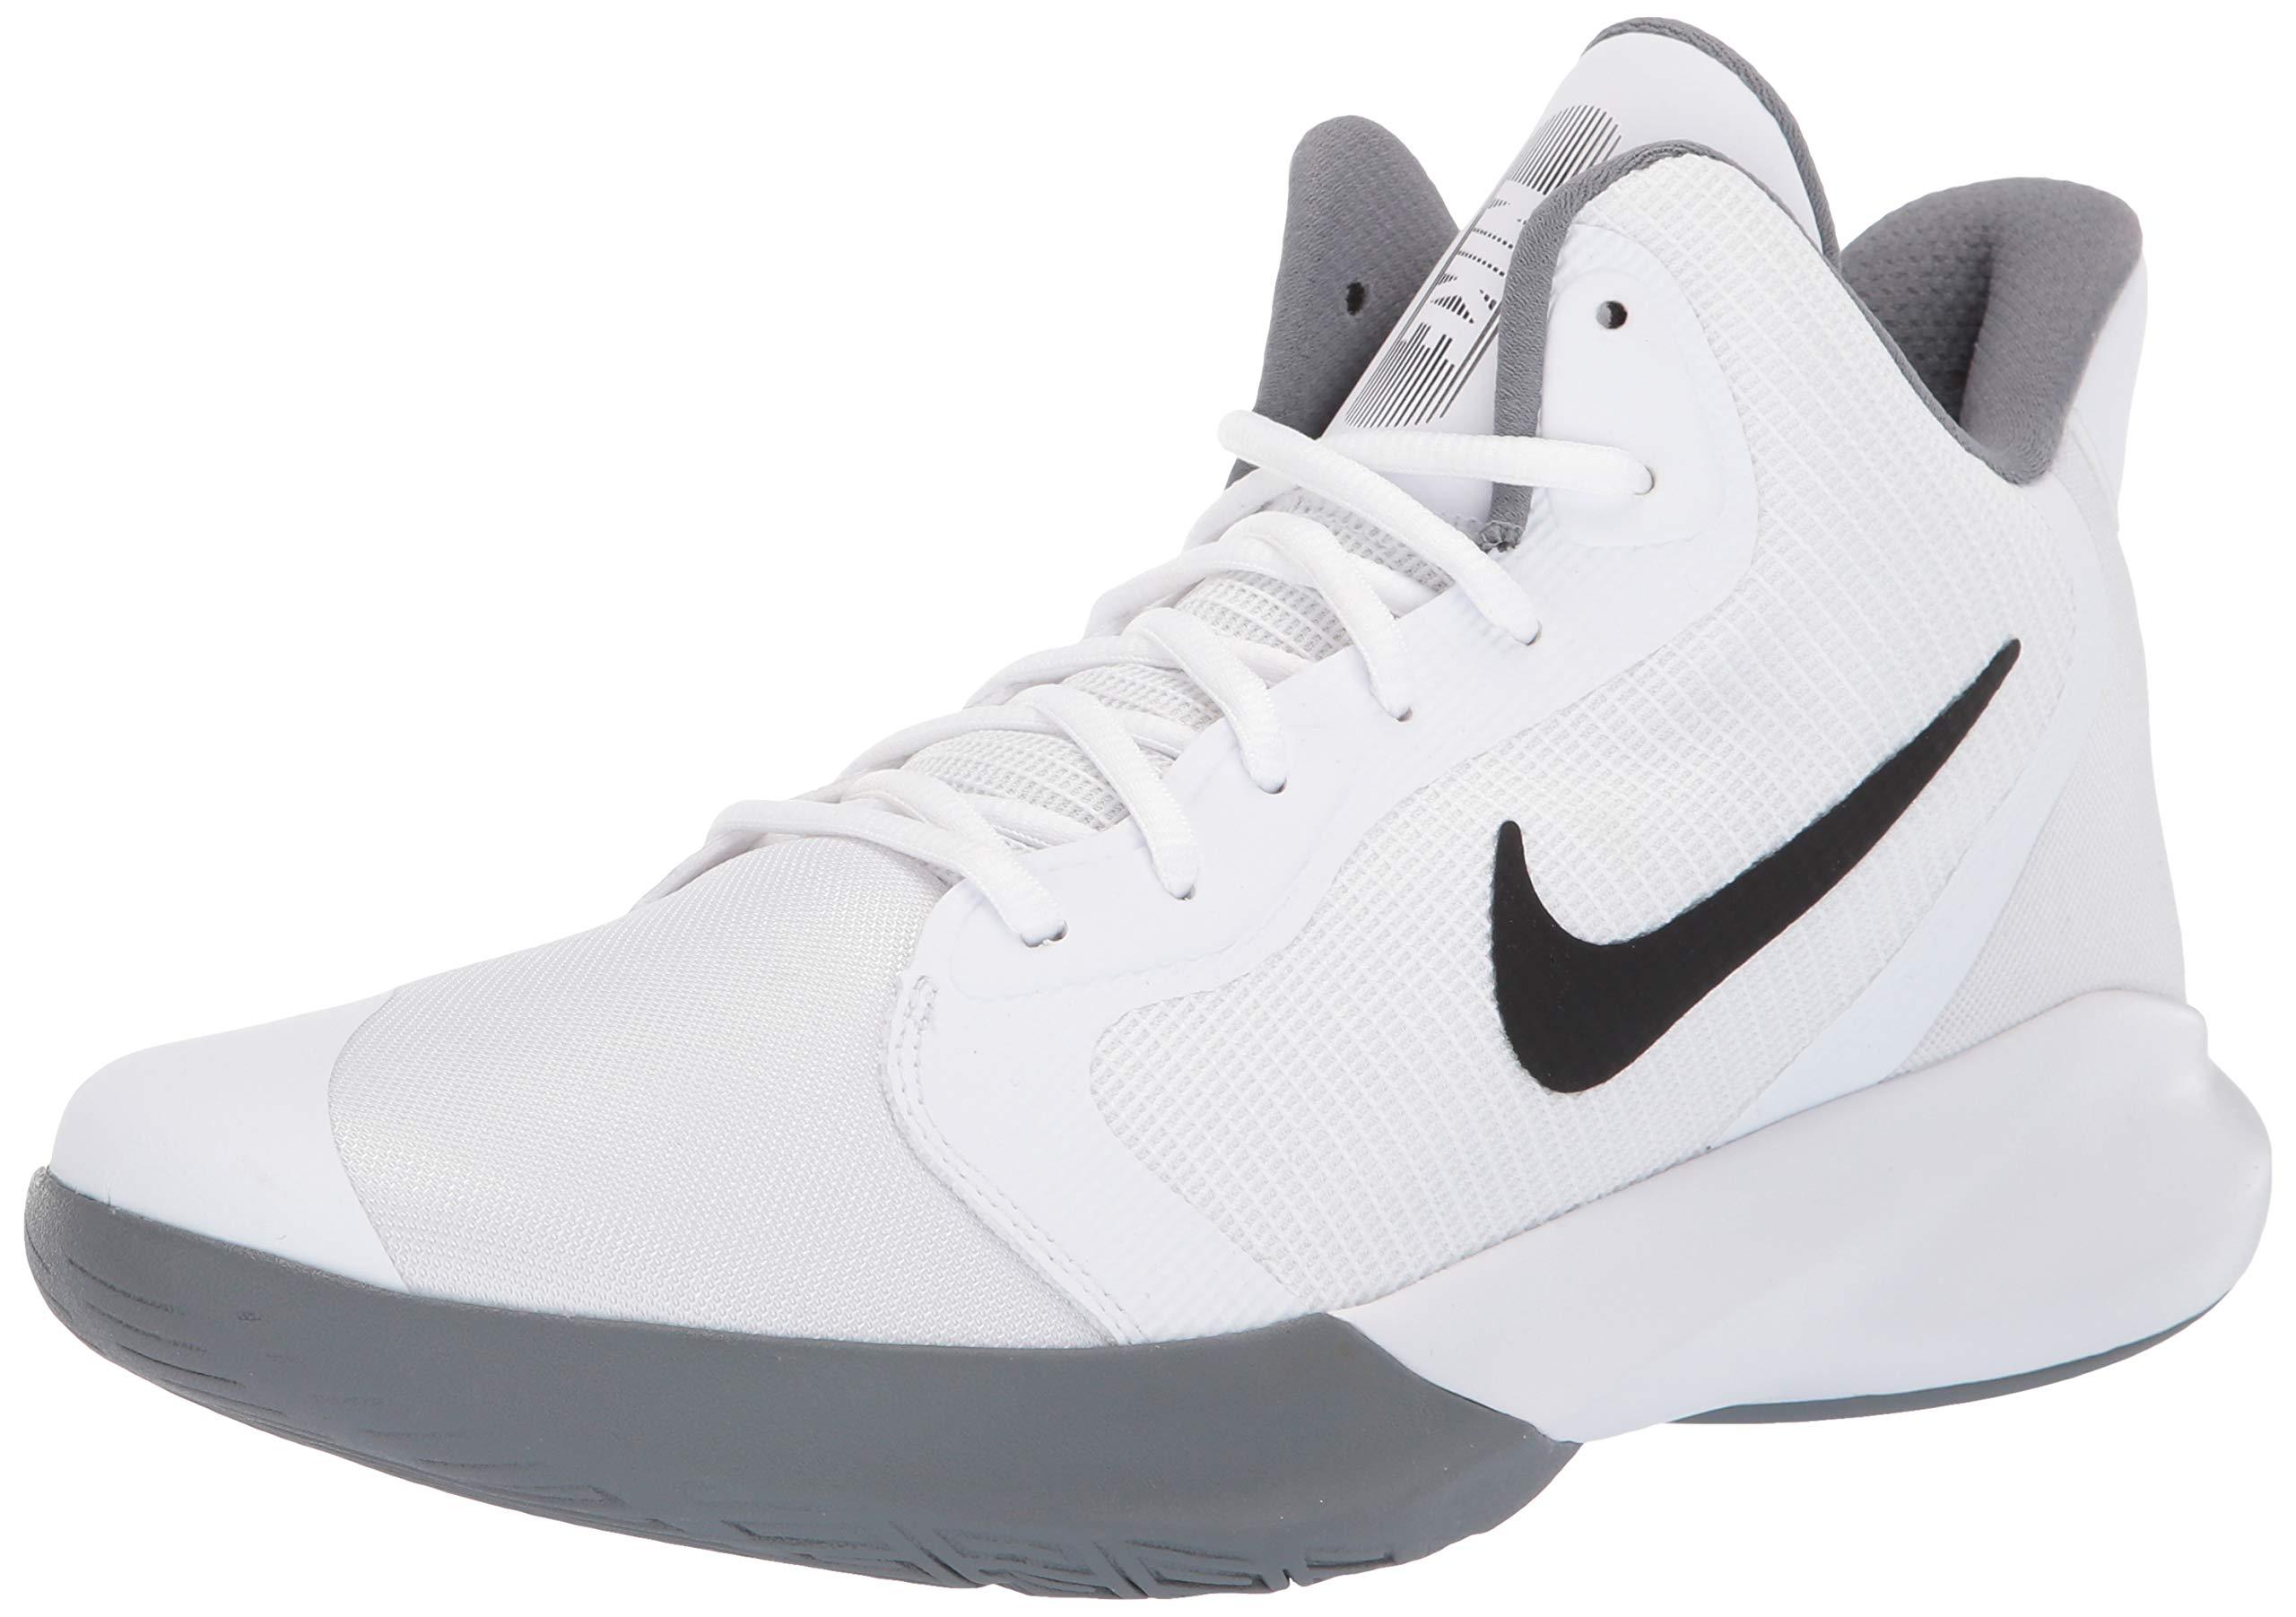 Nike Precision III Basketball Shoe White/Black 7.5 Regular US by Nike